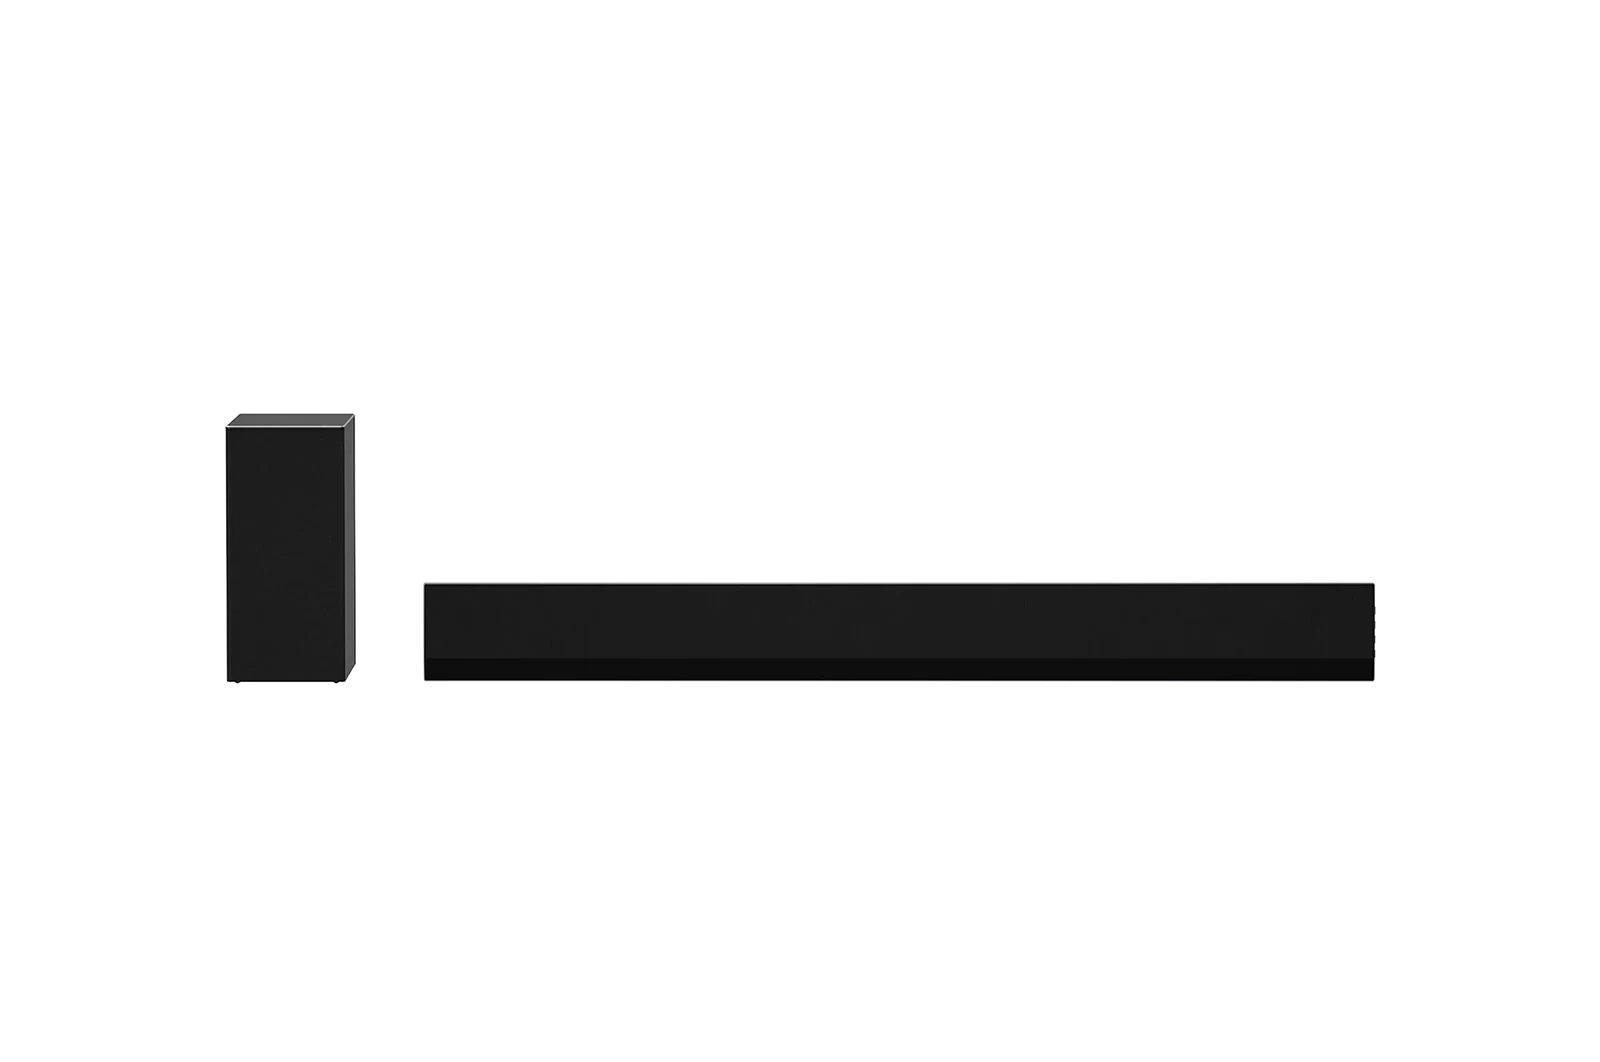 Sound Bar GX AI Sound Pro Dolby Vision & Dolby Atmos 4K Pass Through main image